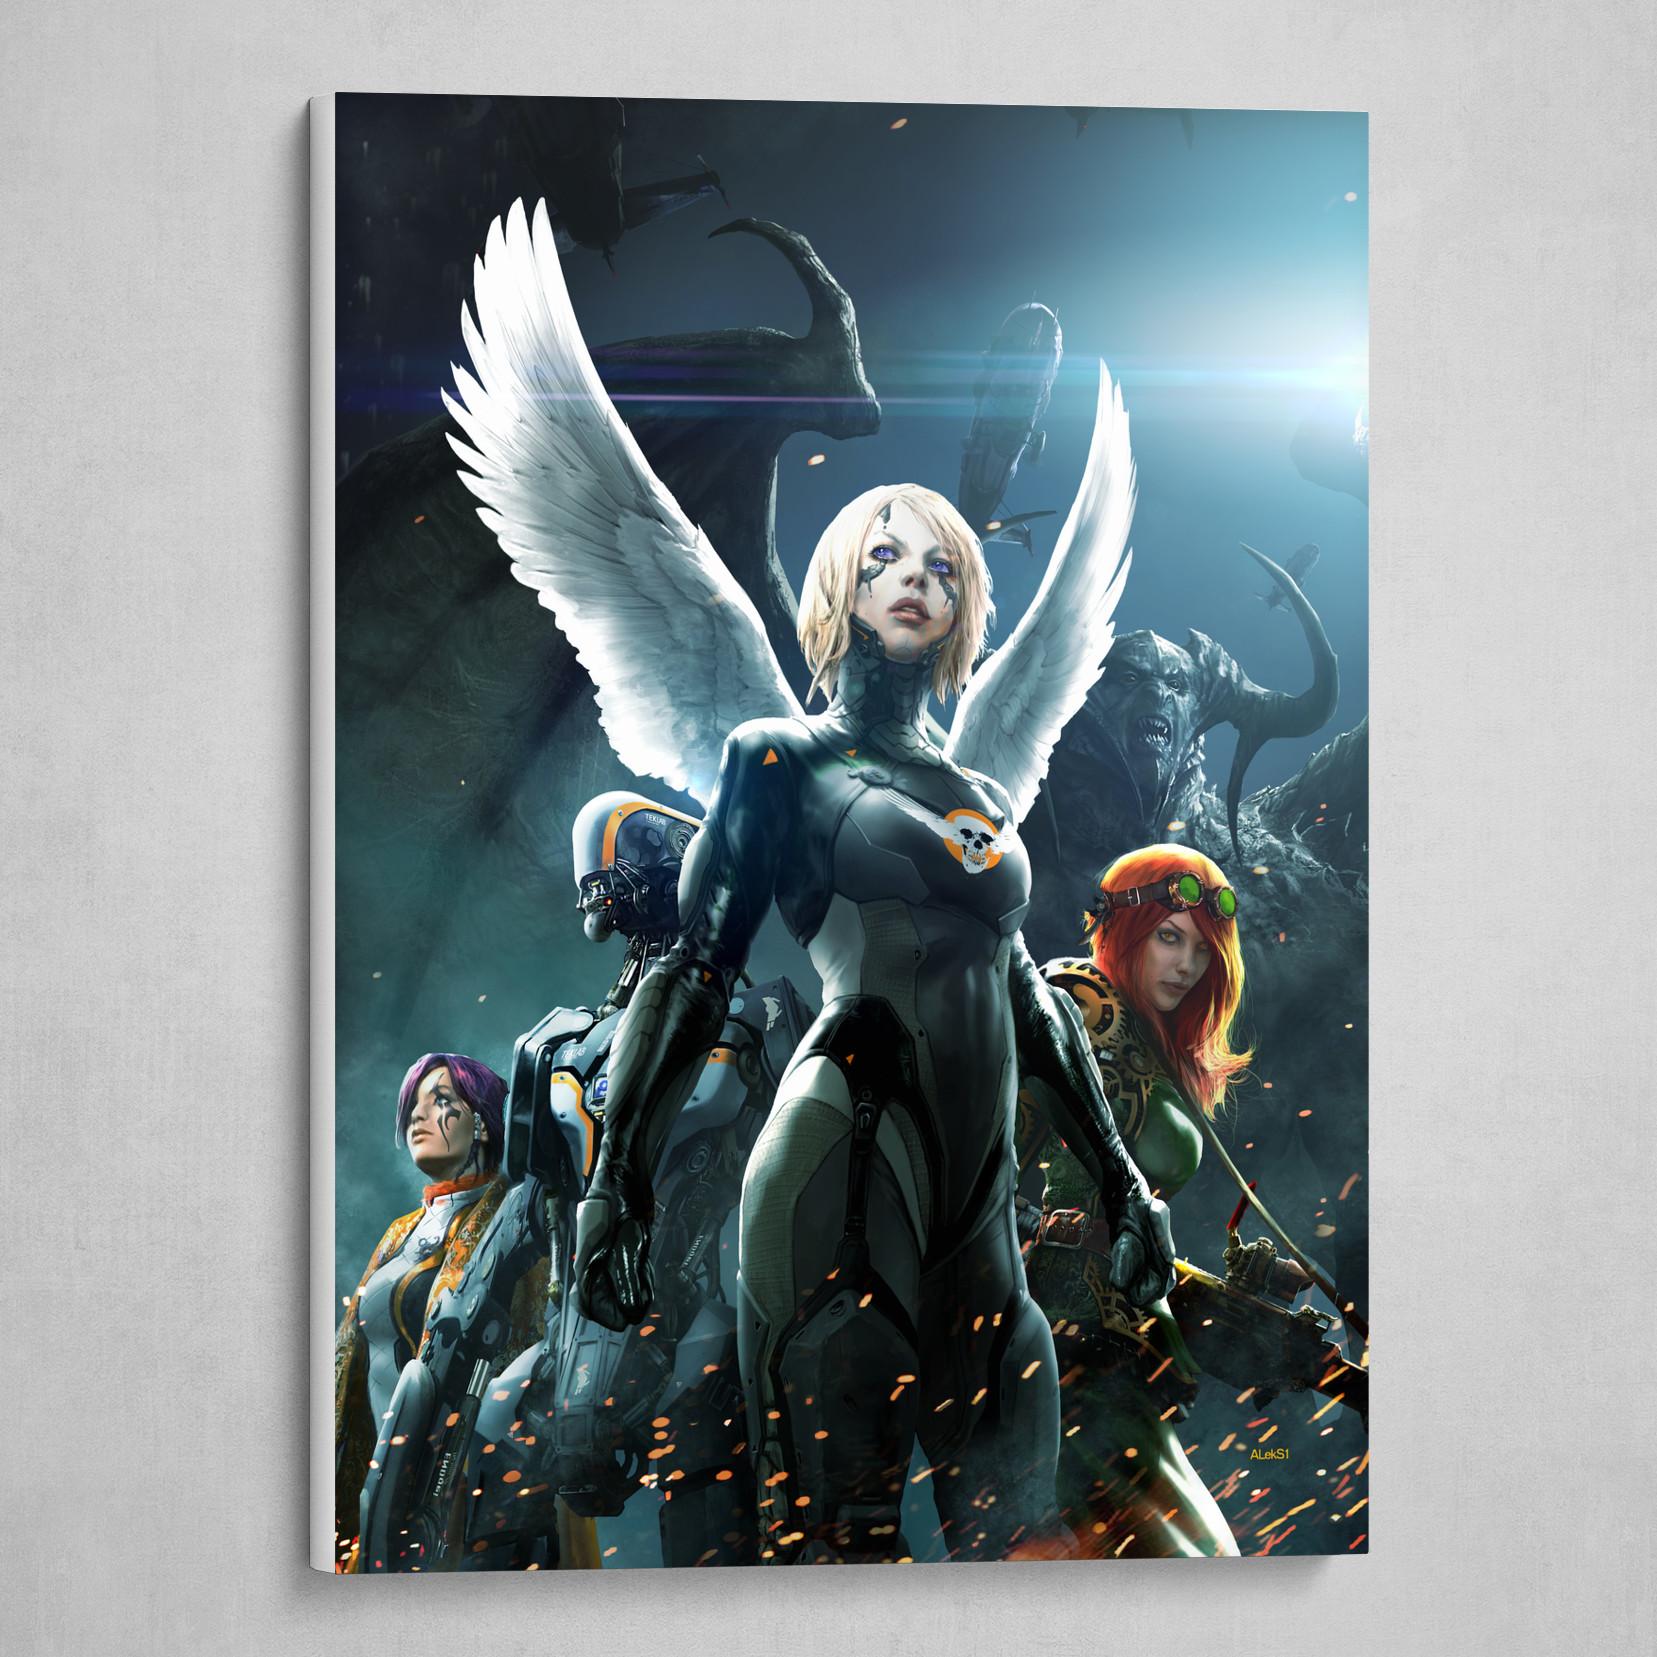 Geekopolis 2015 poster